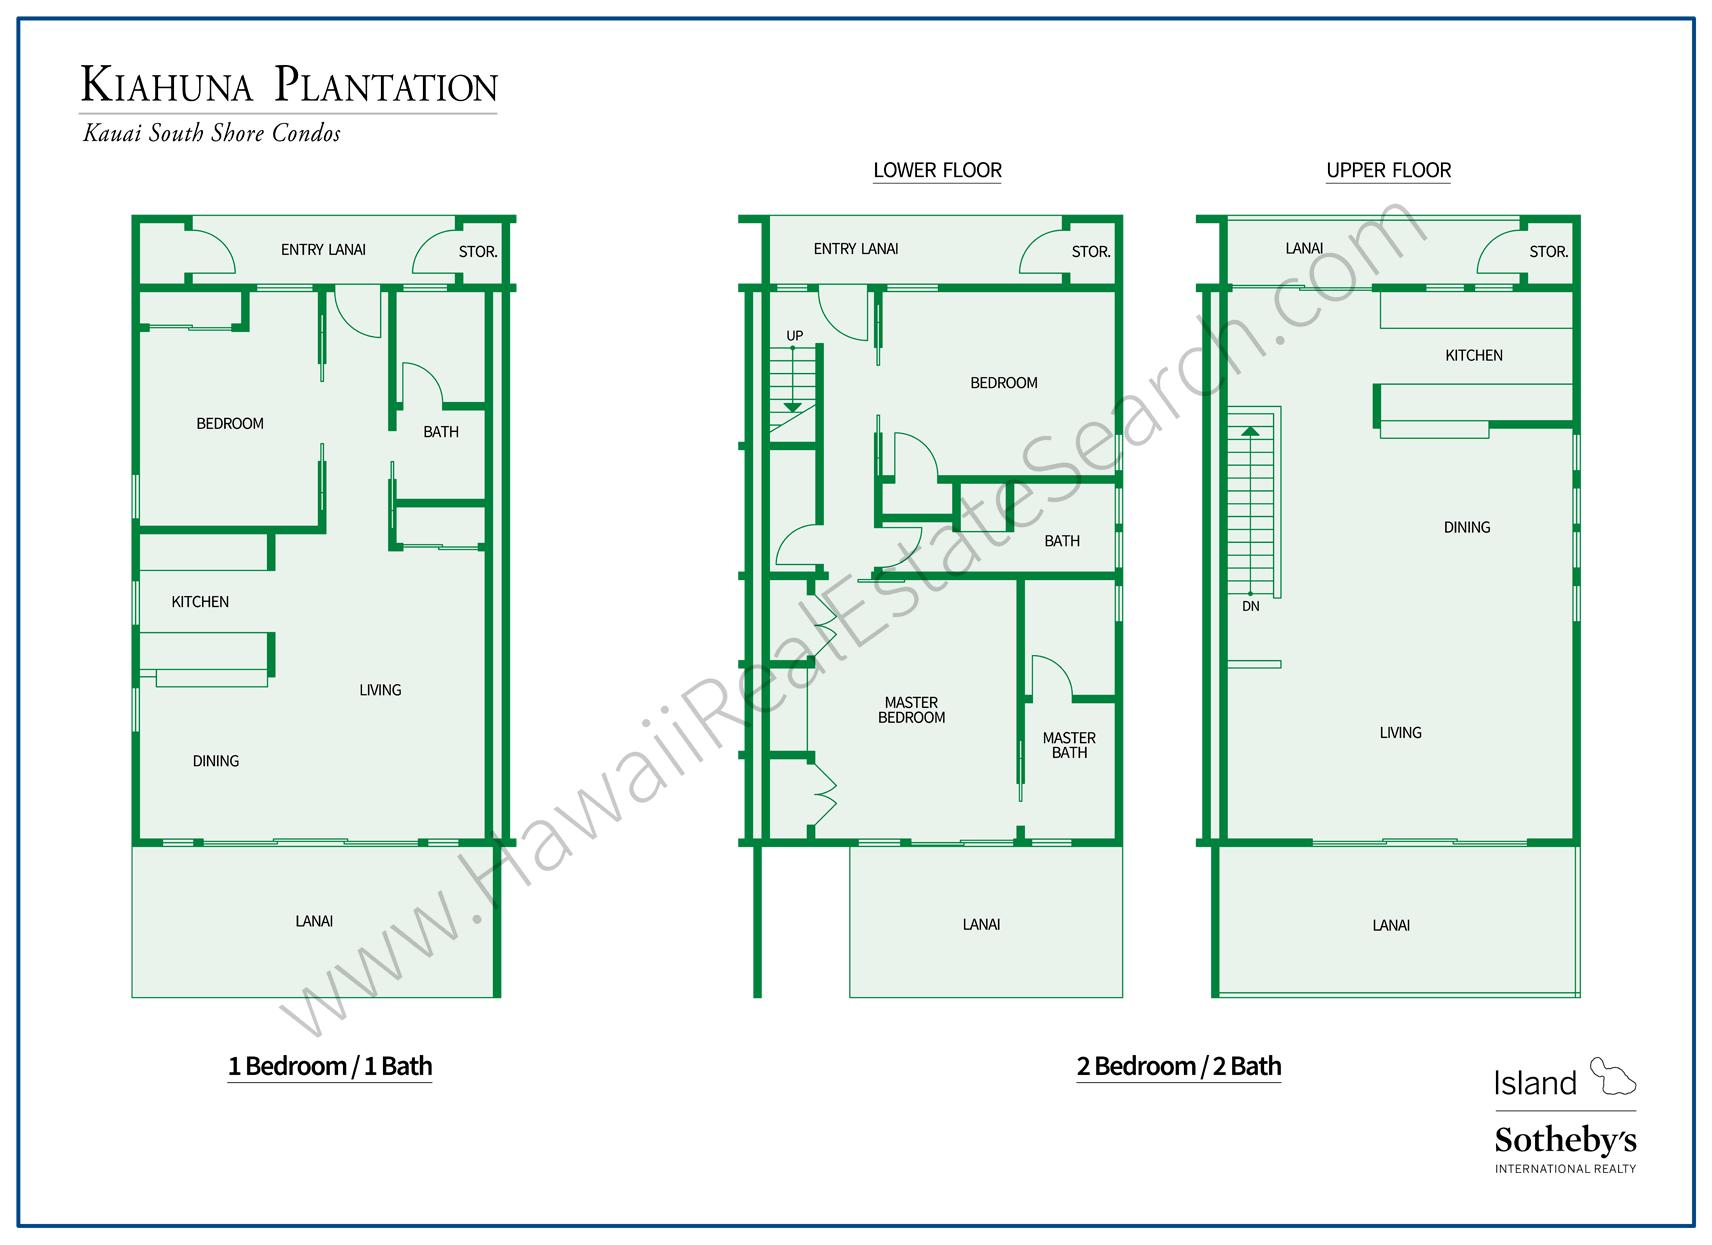 Kiahuna Plantation Condos For Sale | Koloa Real Estate, Kauai on